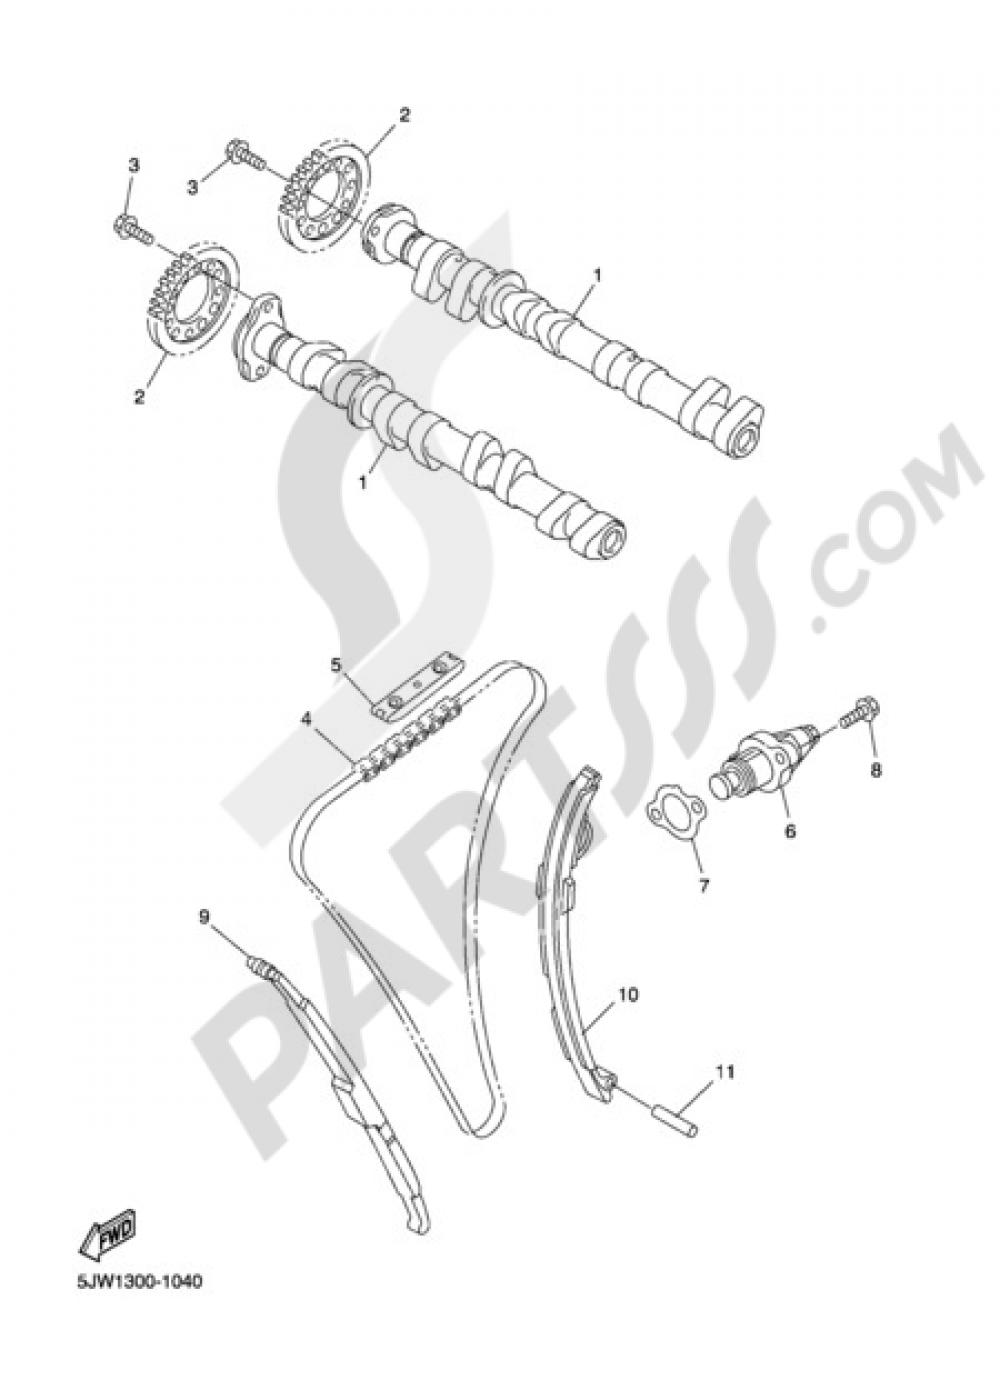 CAMSHAFT & CHAIN Yamaha FJR1300A 2004